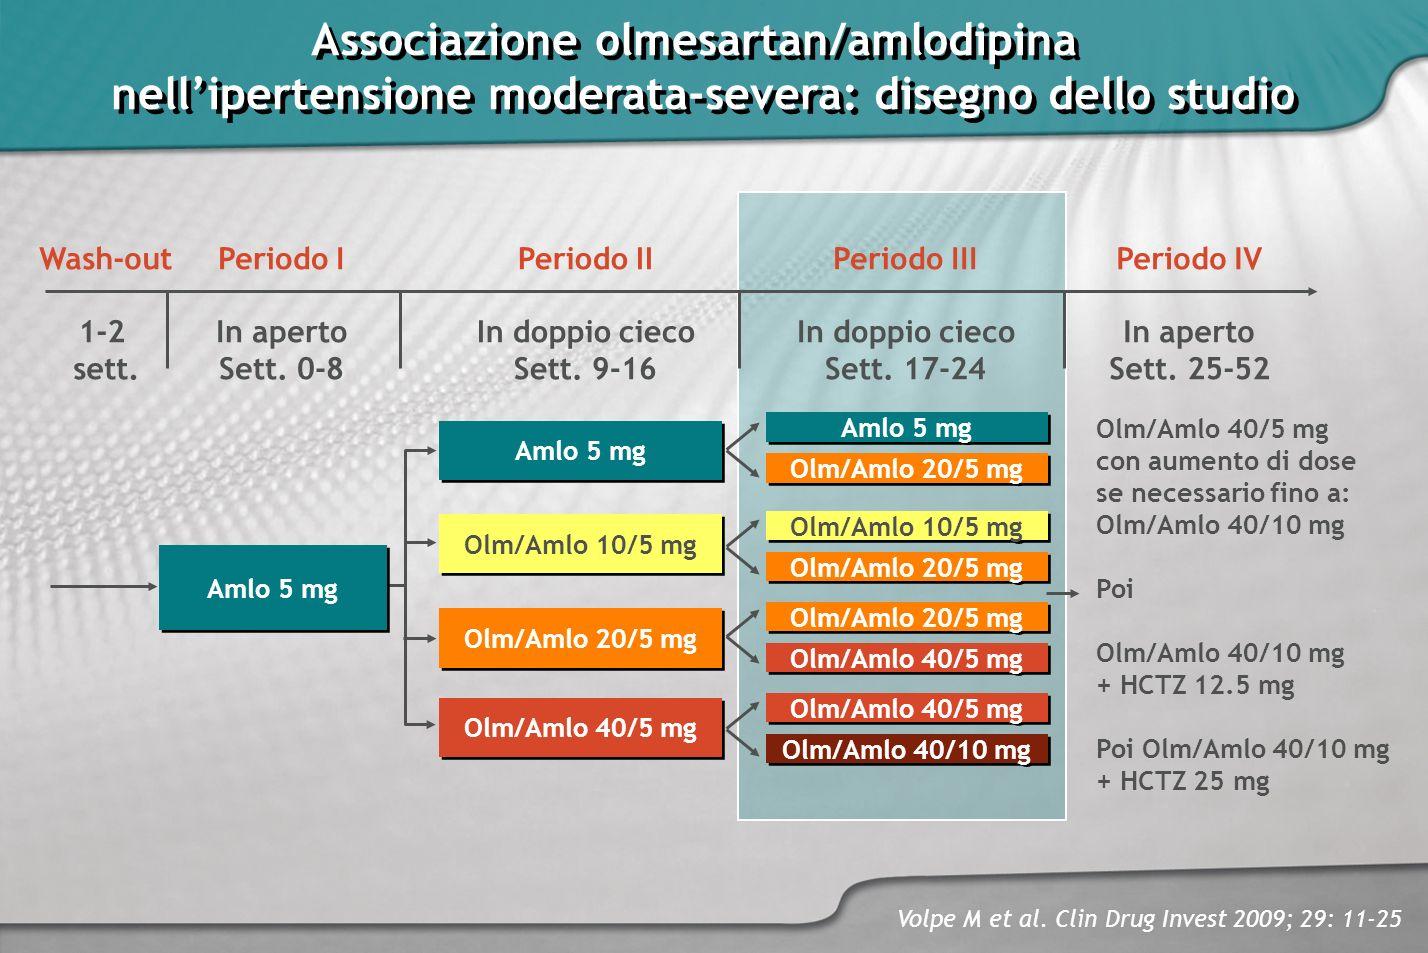 Associazione olmesartan/amlodipina